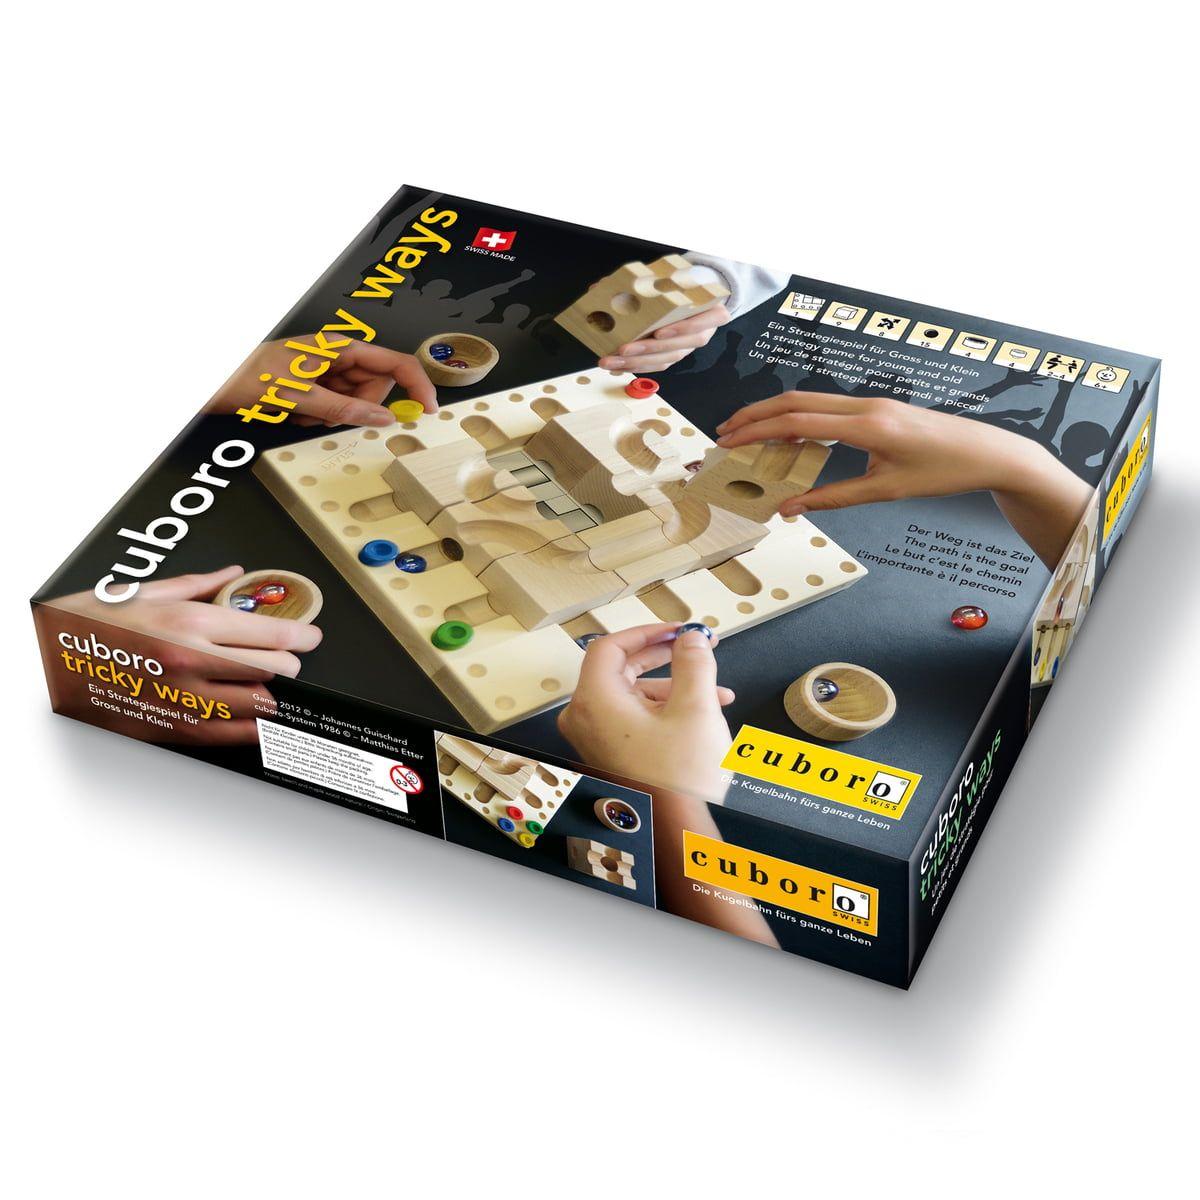 cuboro tricky ways Brettspiel 0190